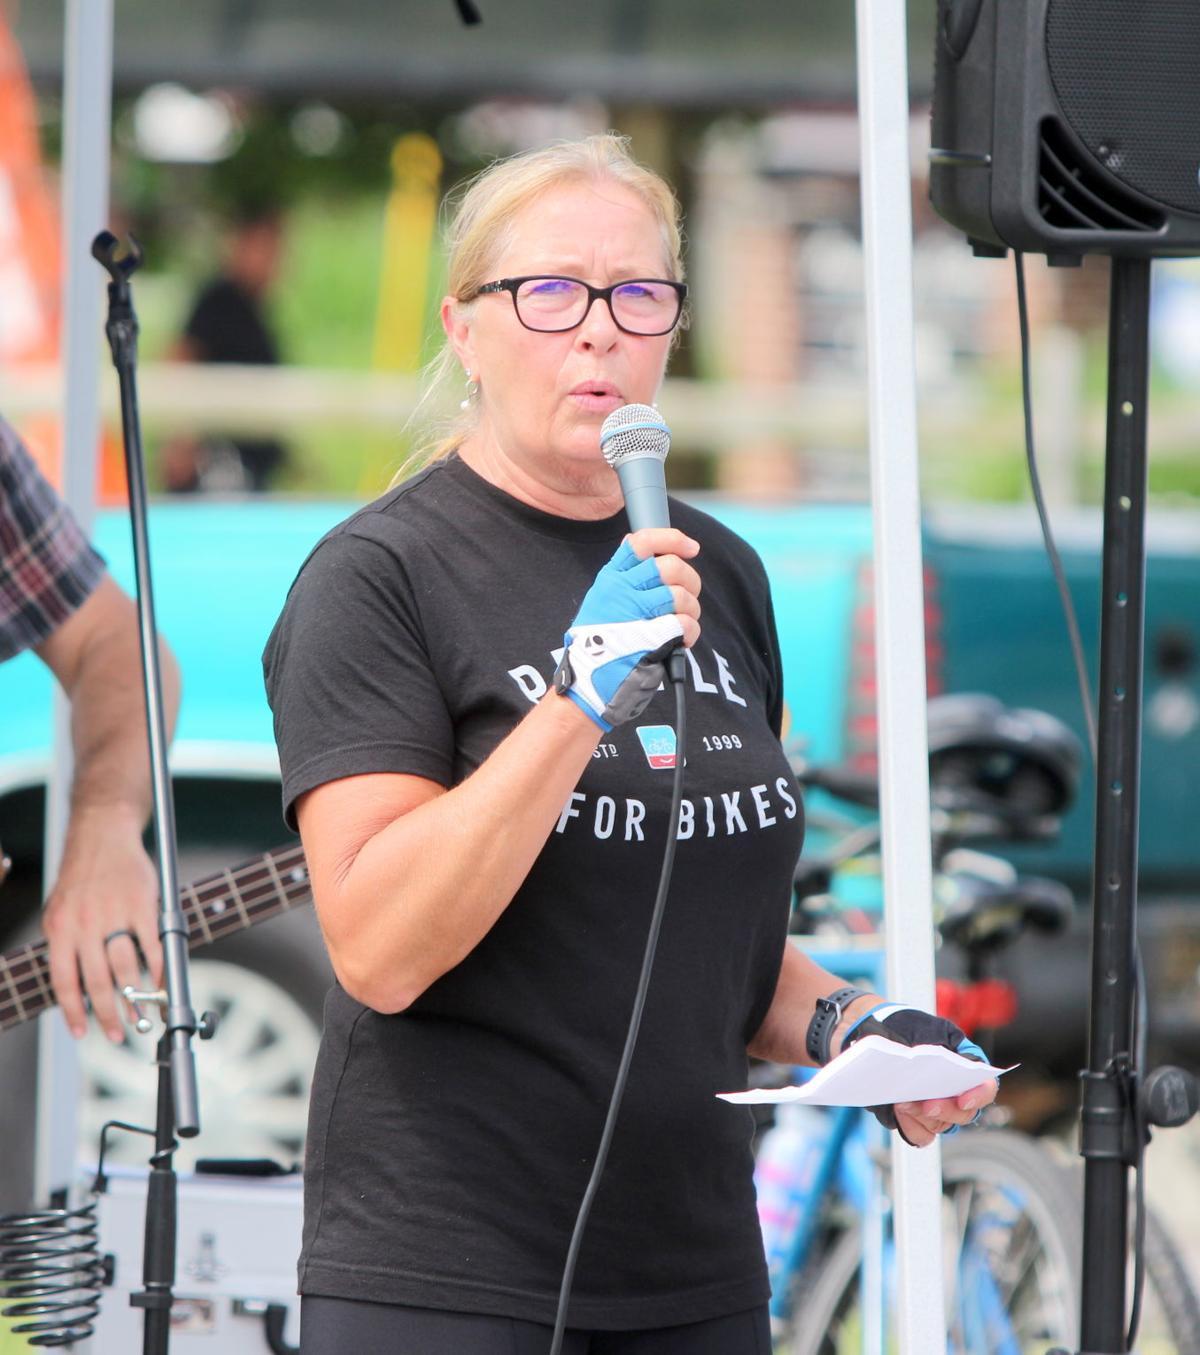 Mayor's Community Bike Ride Raises $14,000